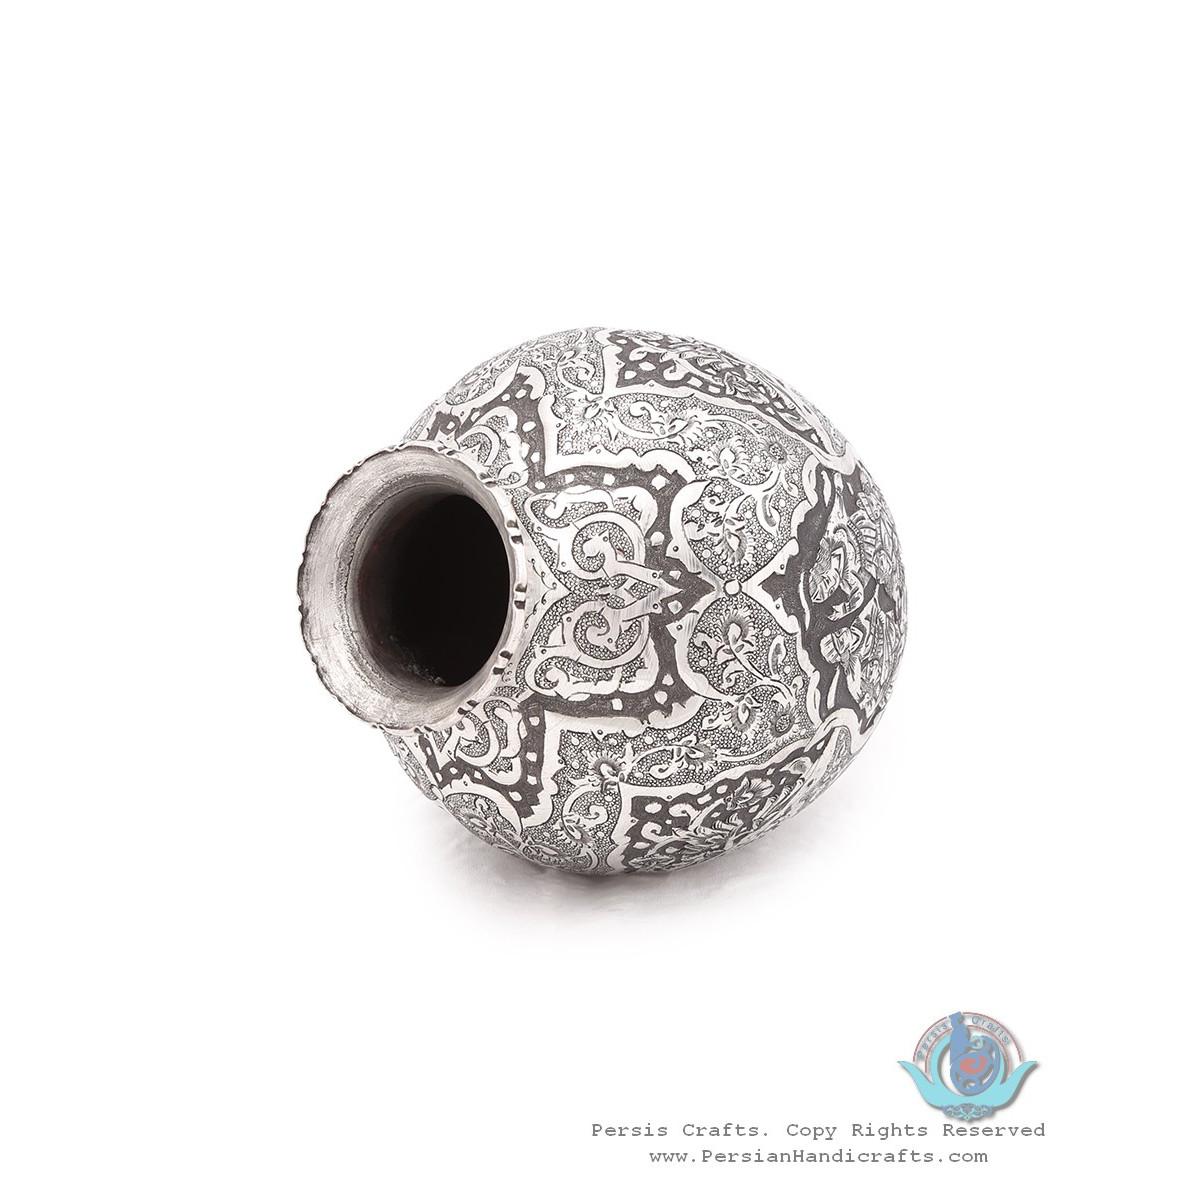 Traditional Handgraved Persian Banquet on Jug Style Flower Vase - HGL3904-Persian Handicrafts